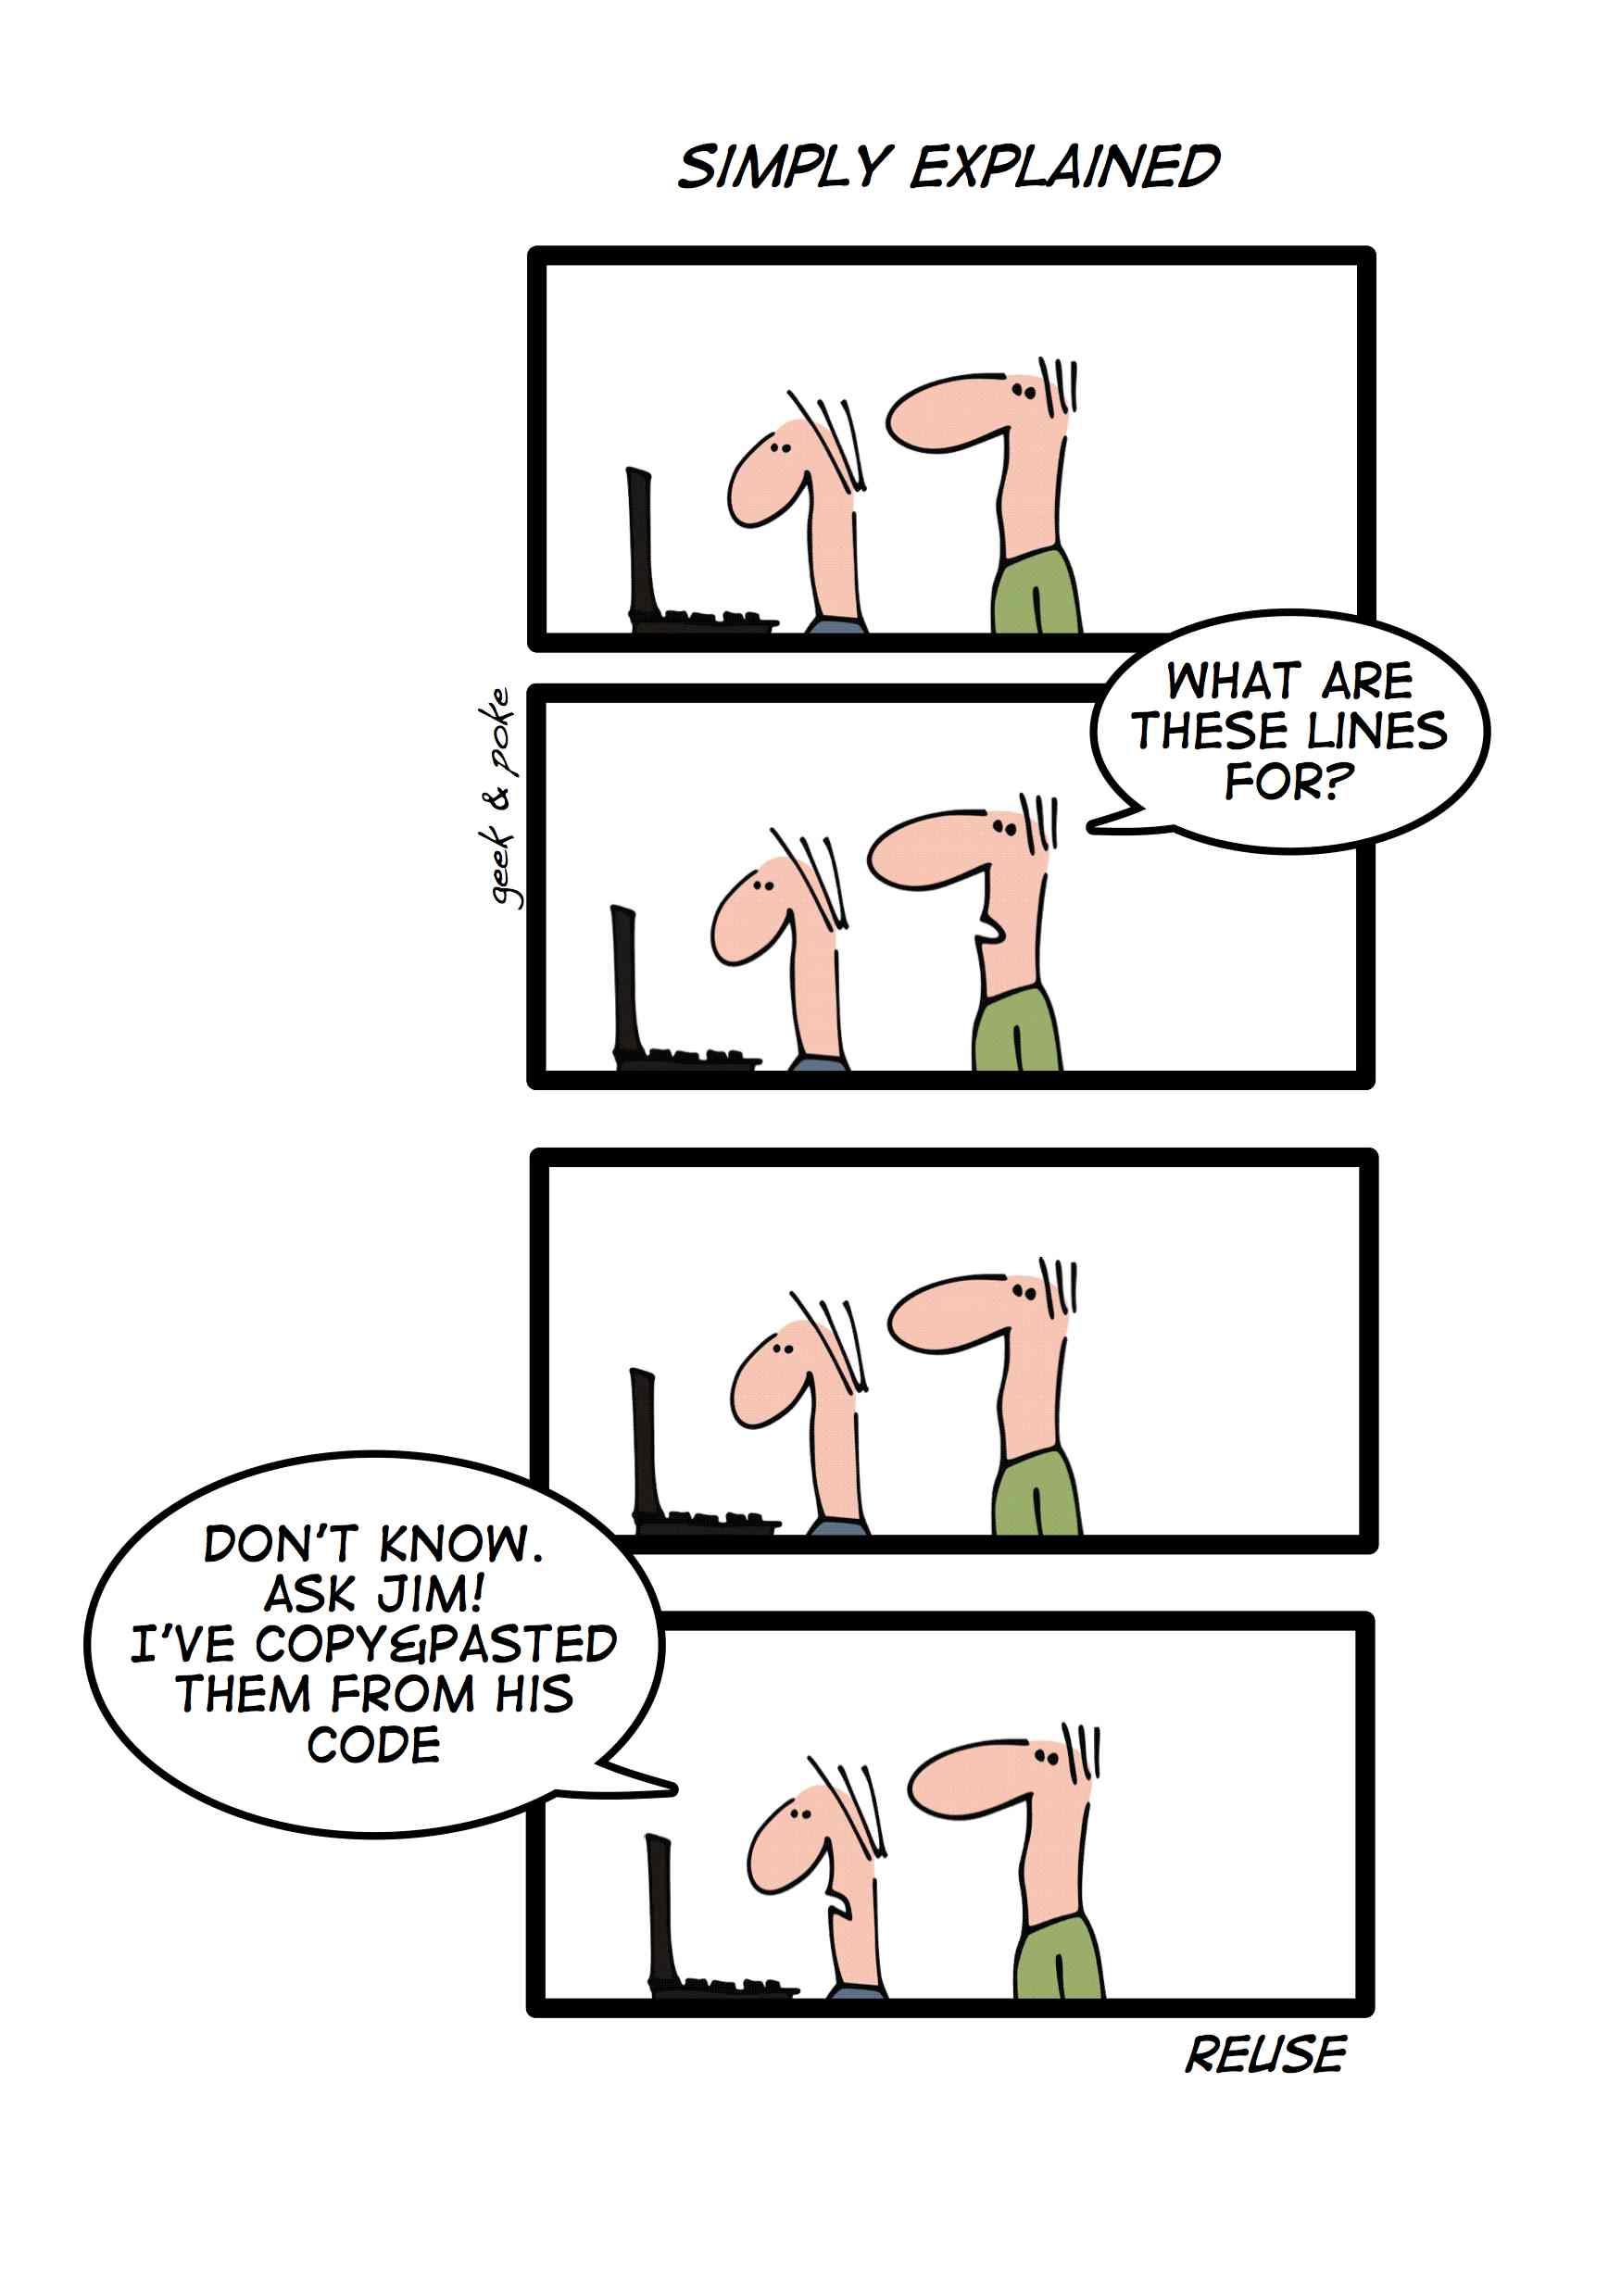 Simply Explained (Geek & Poke)